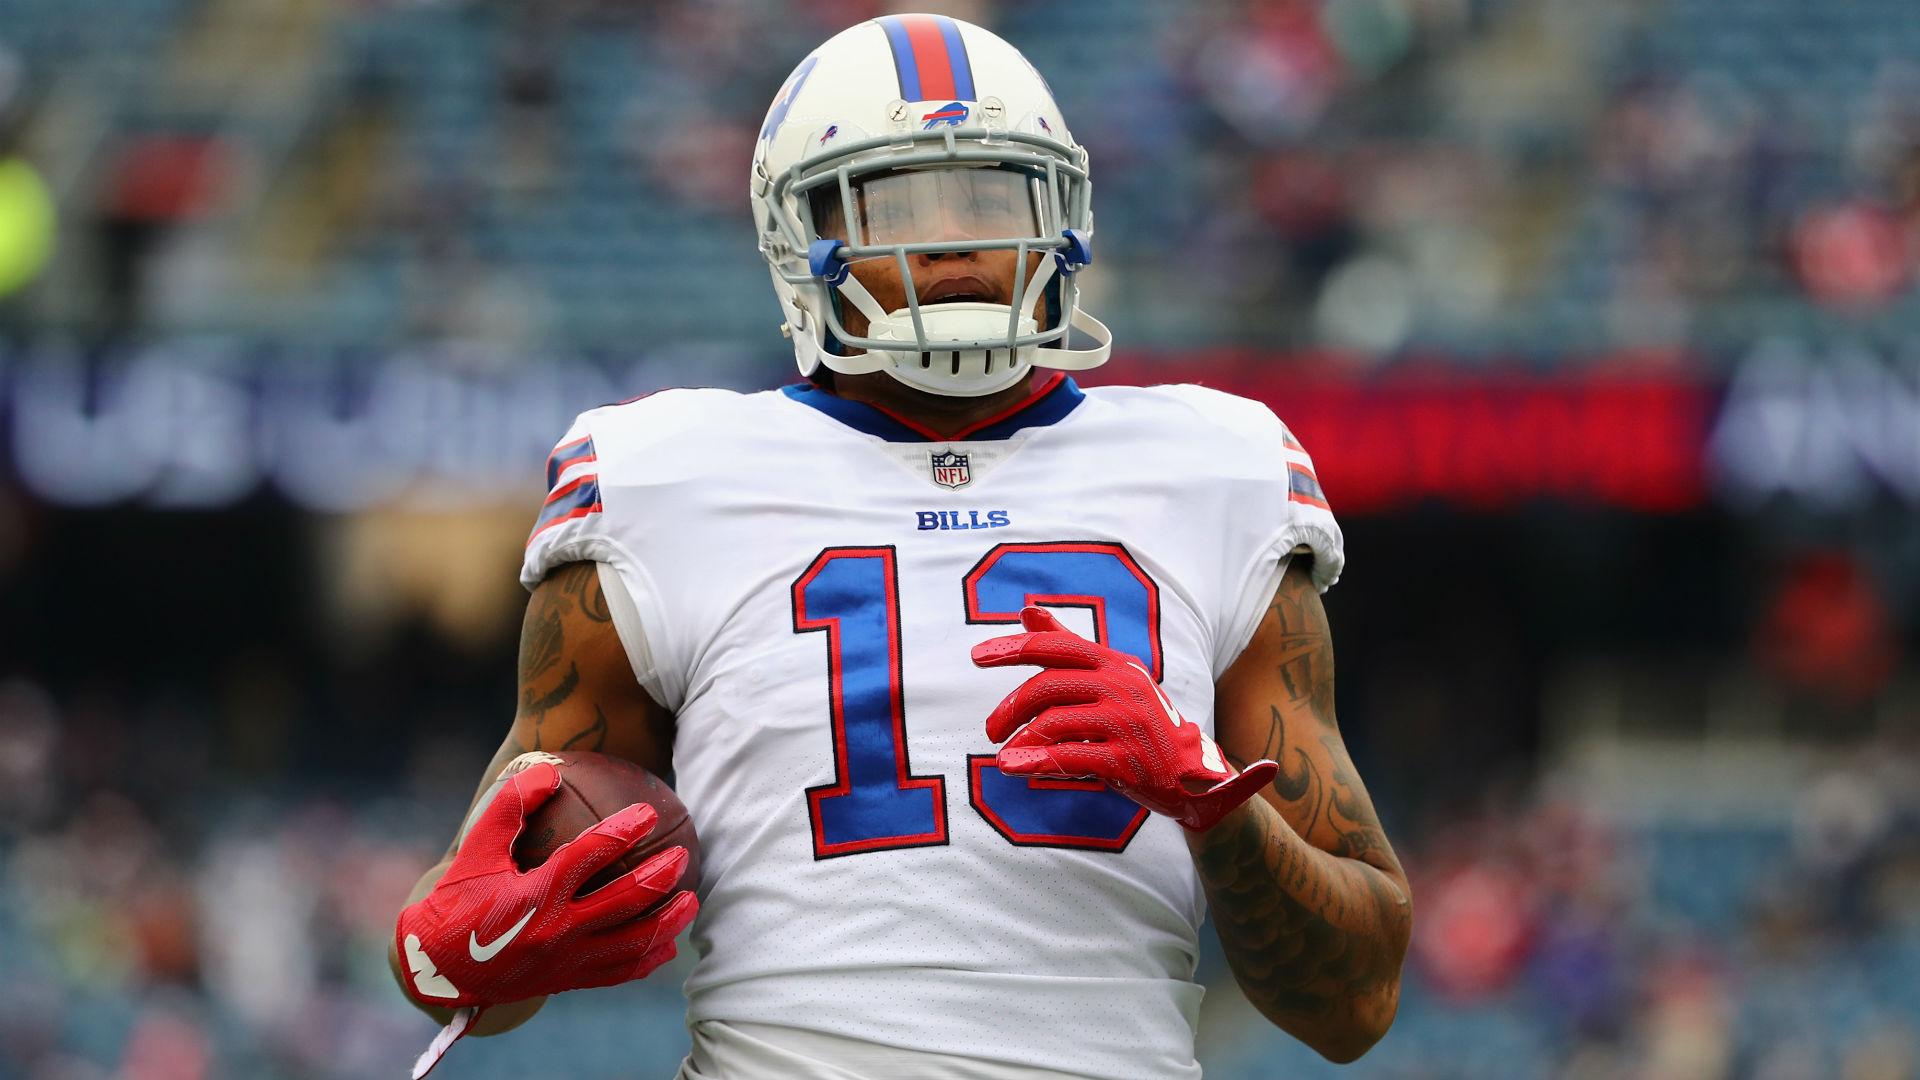 Josh Allen of Buffalo Bills week to week with injured elbow